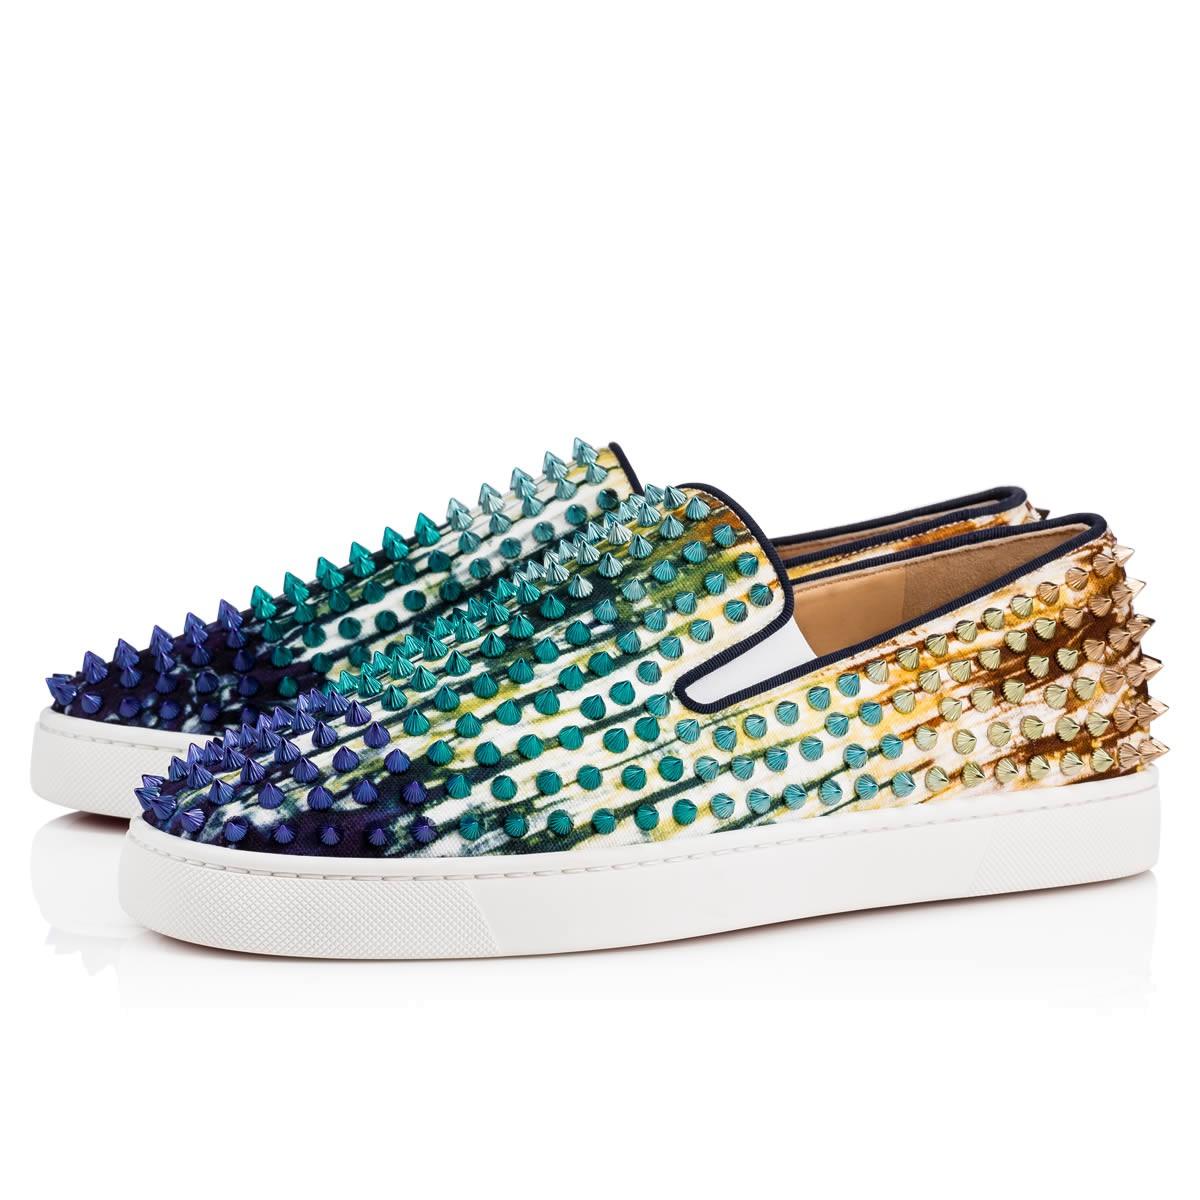 ... sale louboutin for man sneakers christian louboutin flat spike boat  shoes item no 726340 63b45 a8e39